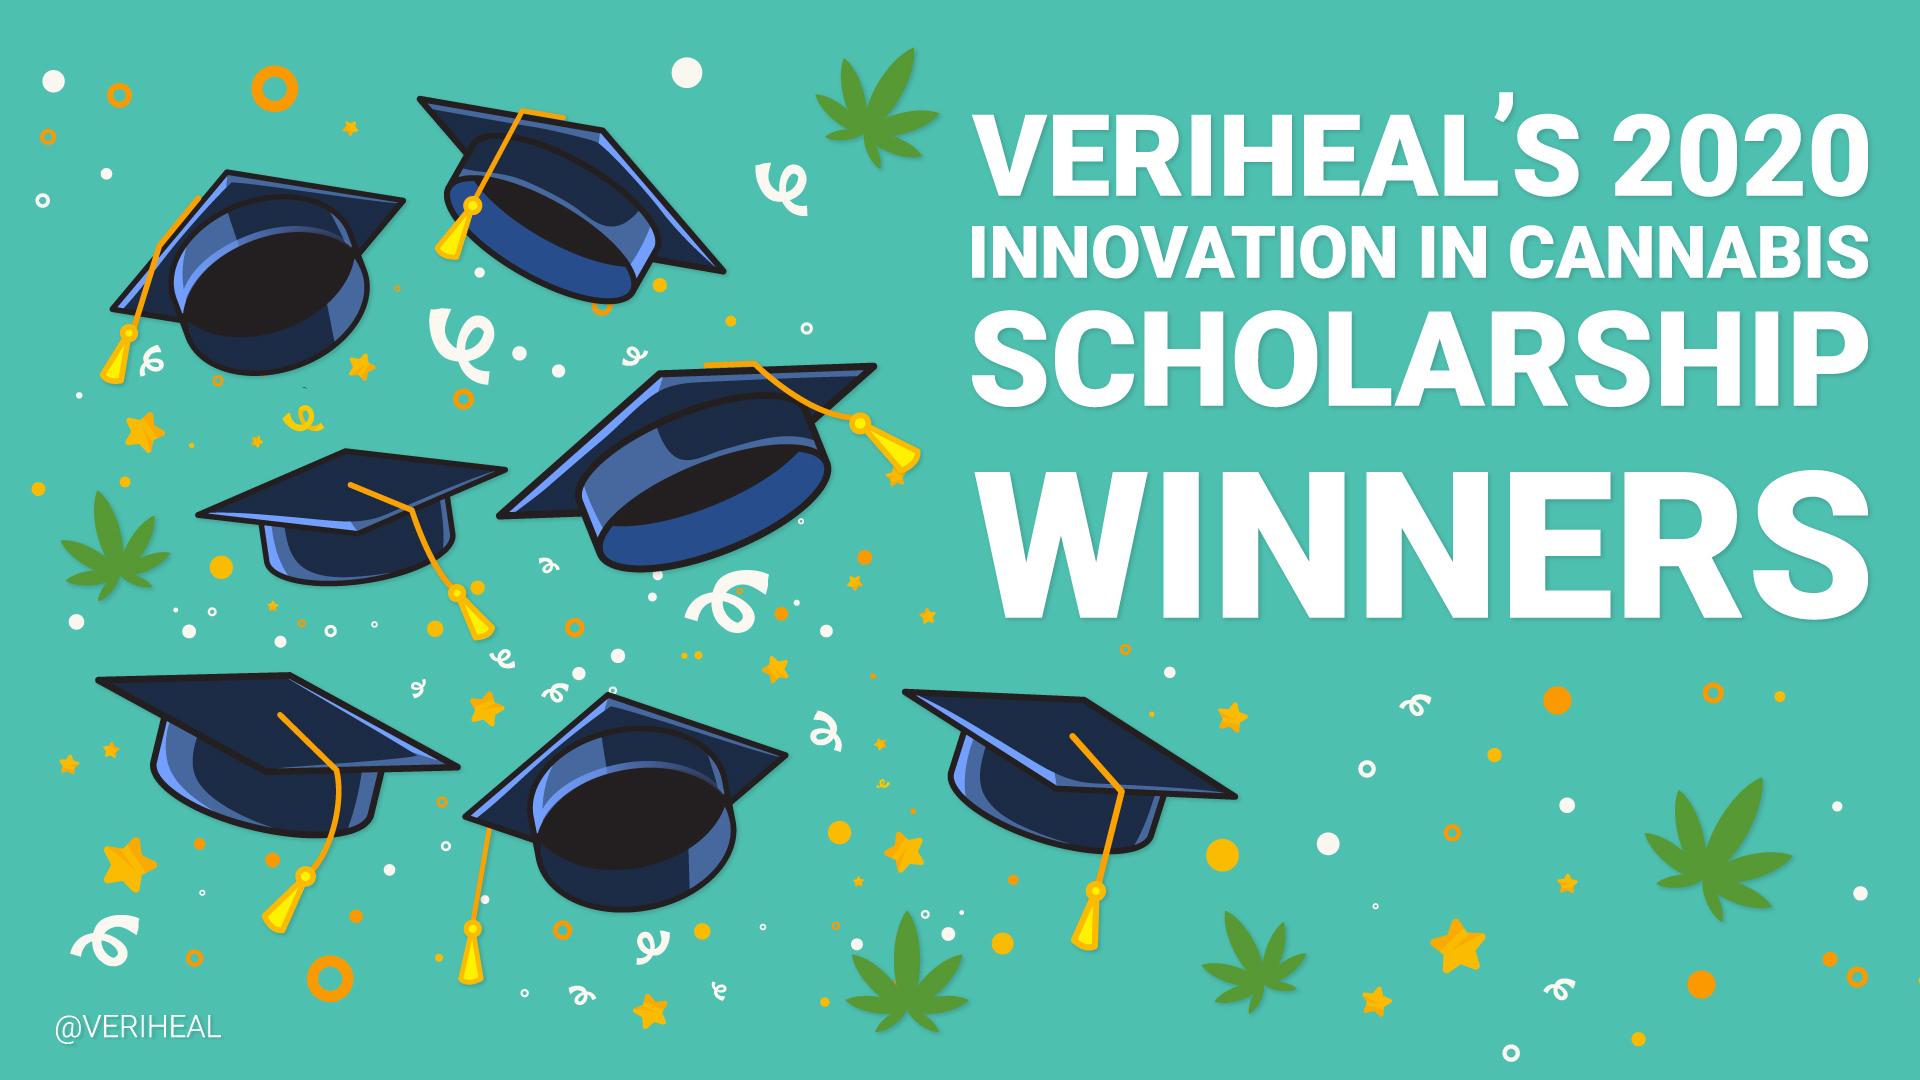 Veriheal's Innovation in Cannabis Scholarship 2020 Winners